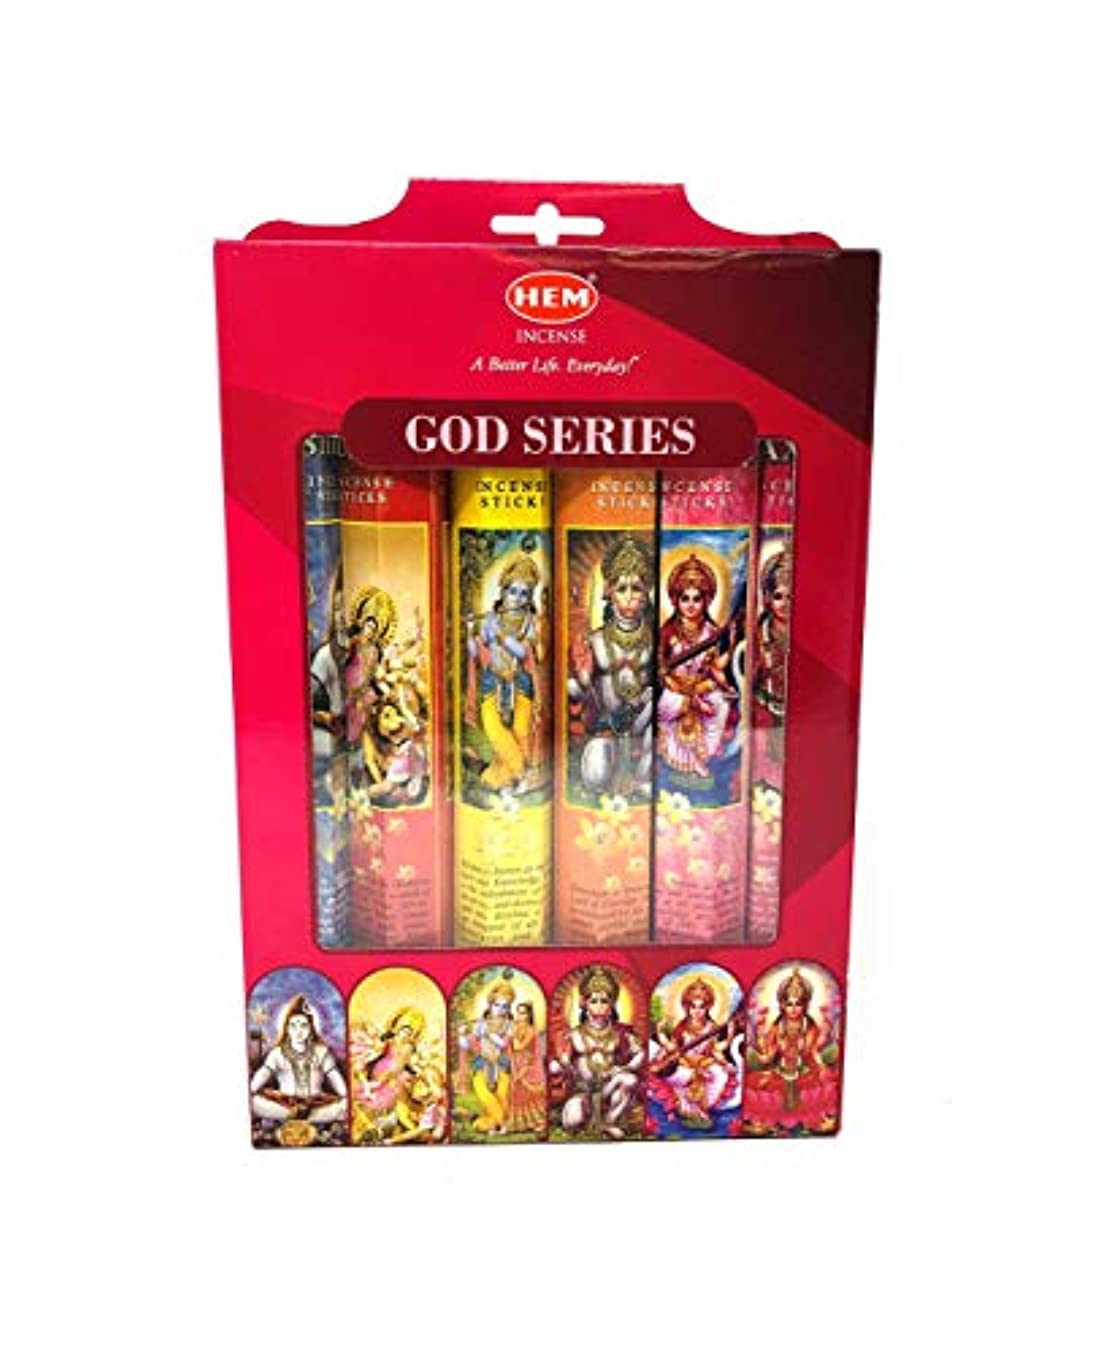 印象的債務突破口Hem Indian God Series Incense Sticks Variety Combo #1 6 x 20 = 120 Total by Hem